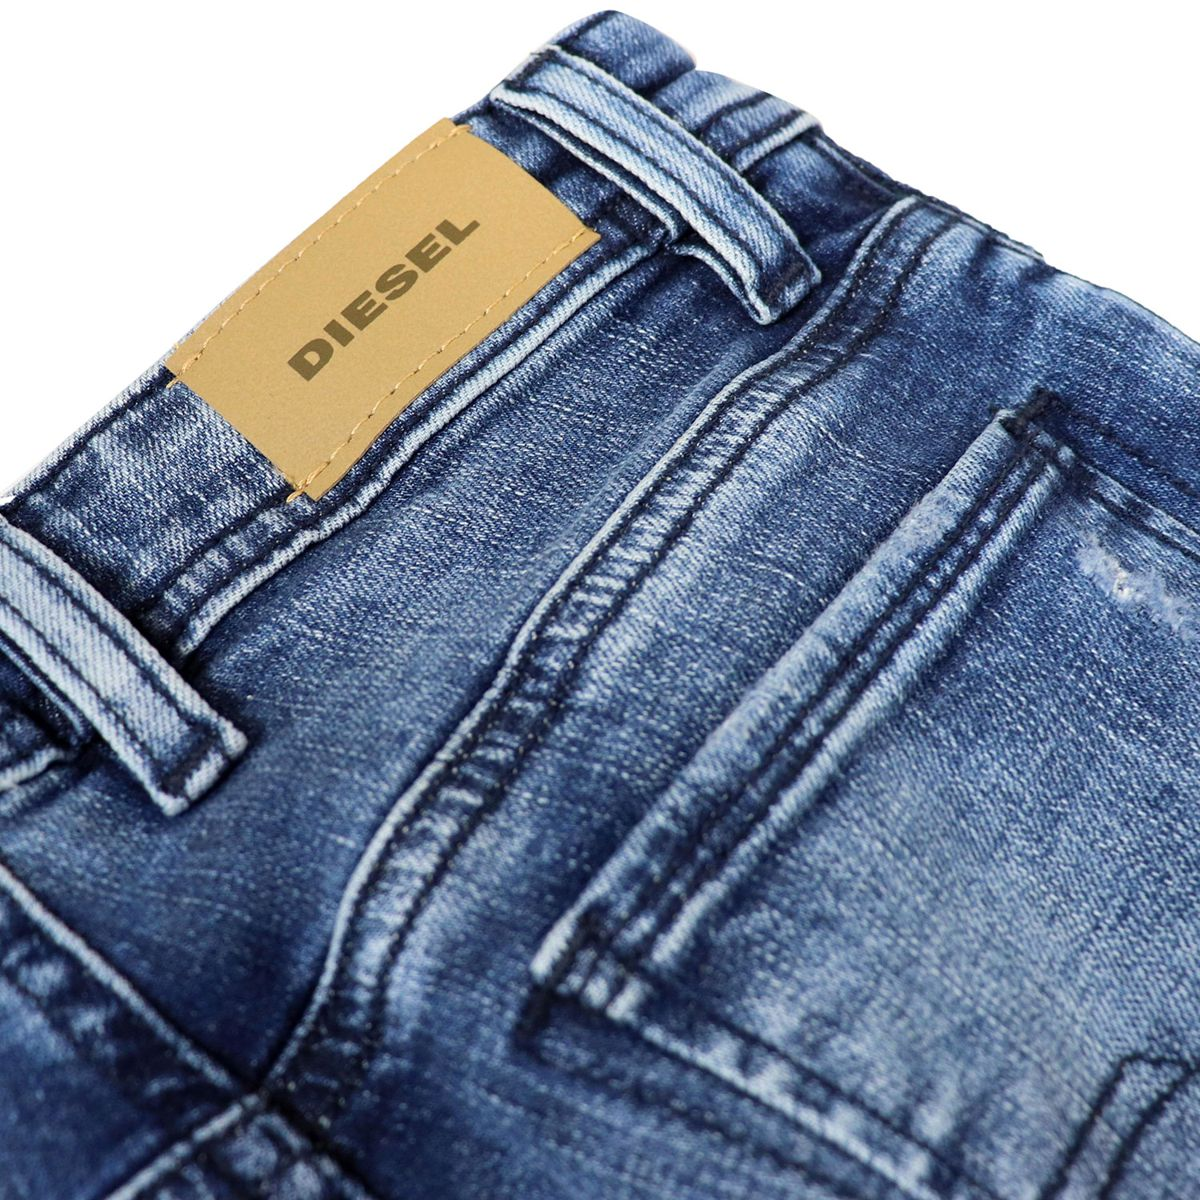 Jeans in light slim denim with breaks SLENKER Medium denim Diesel